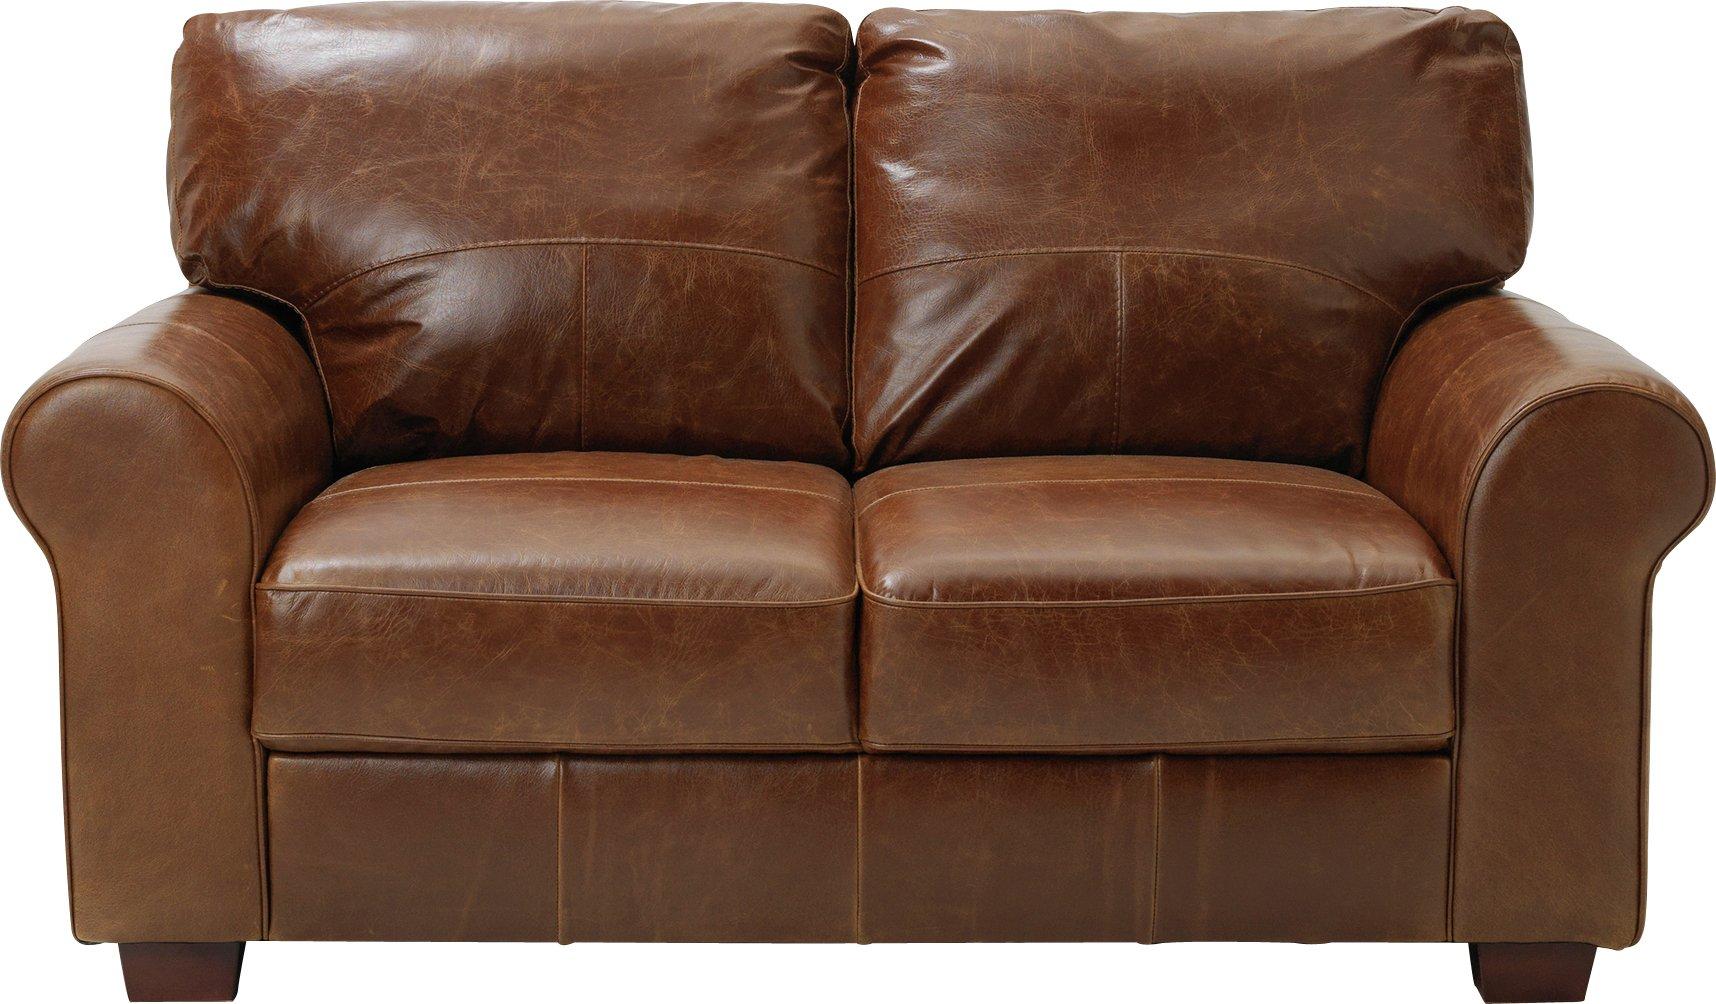 Sale On Argos Home Salisbury 2 Seater Leather Sofa